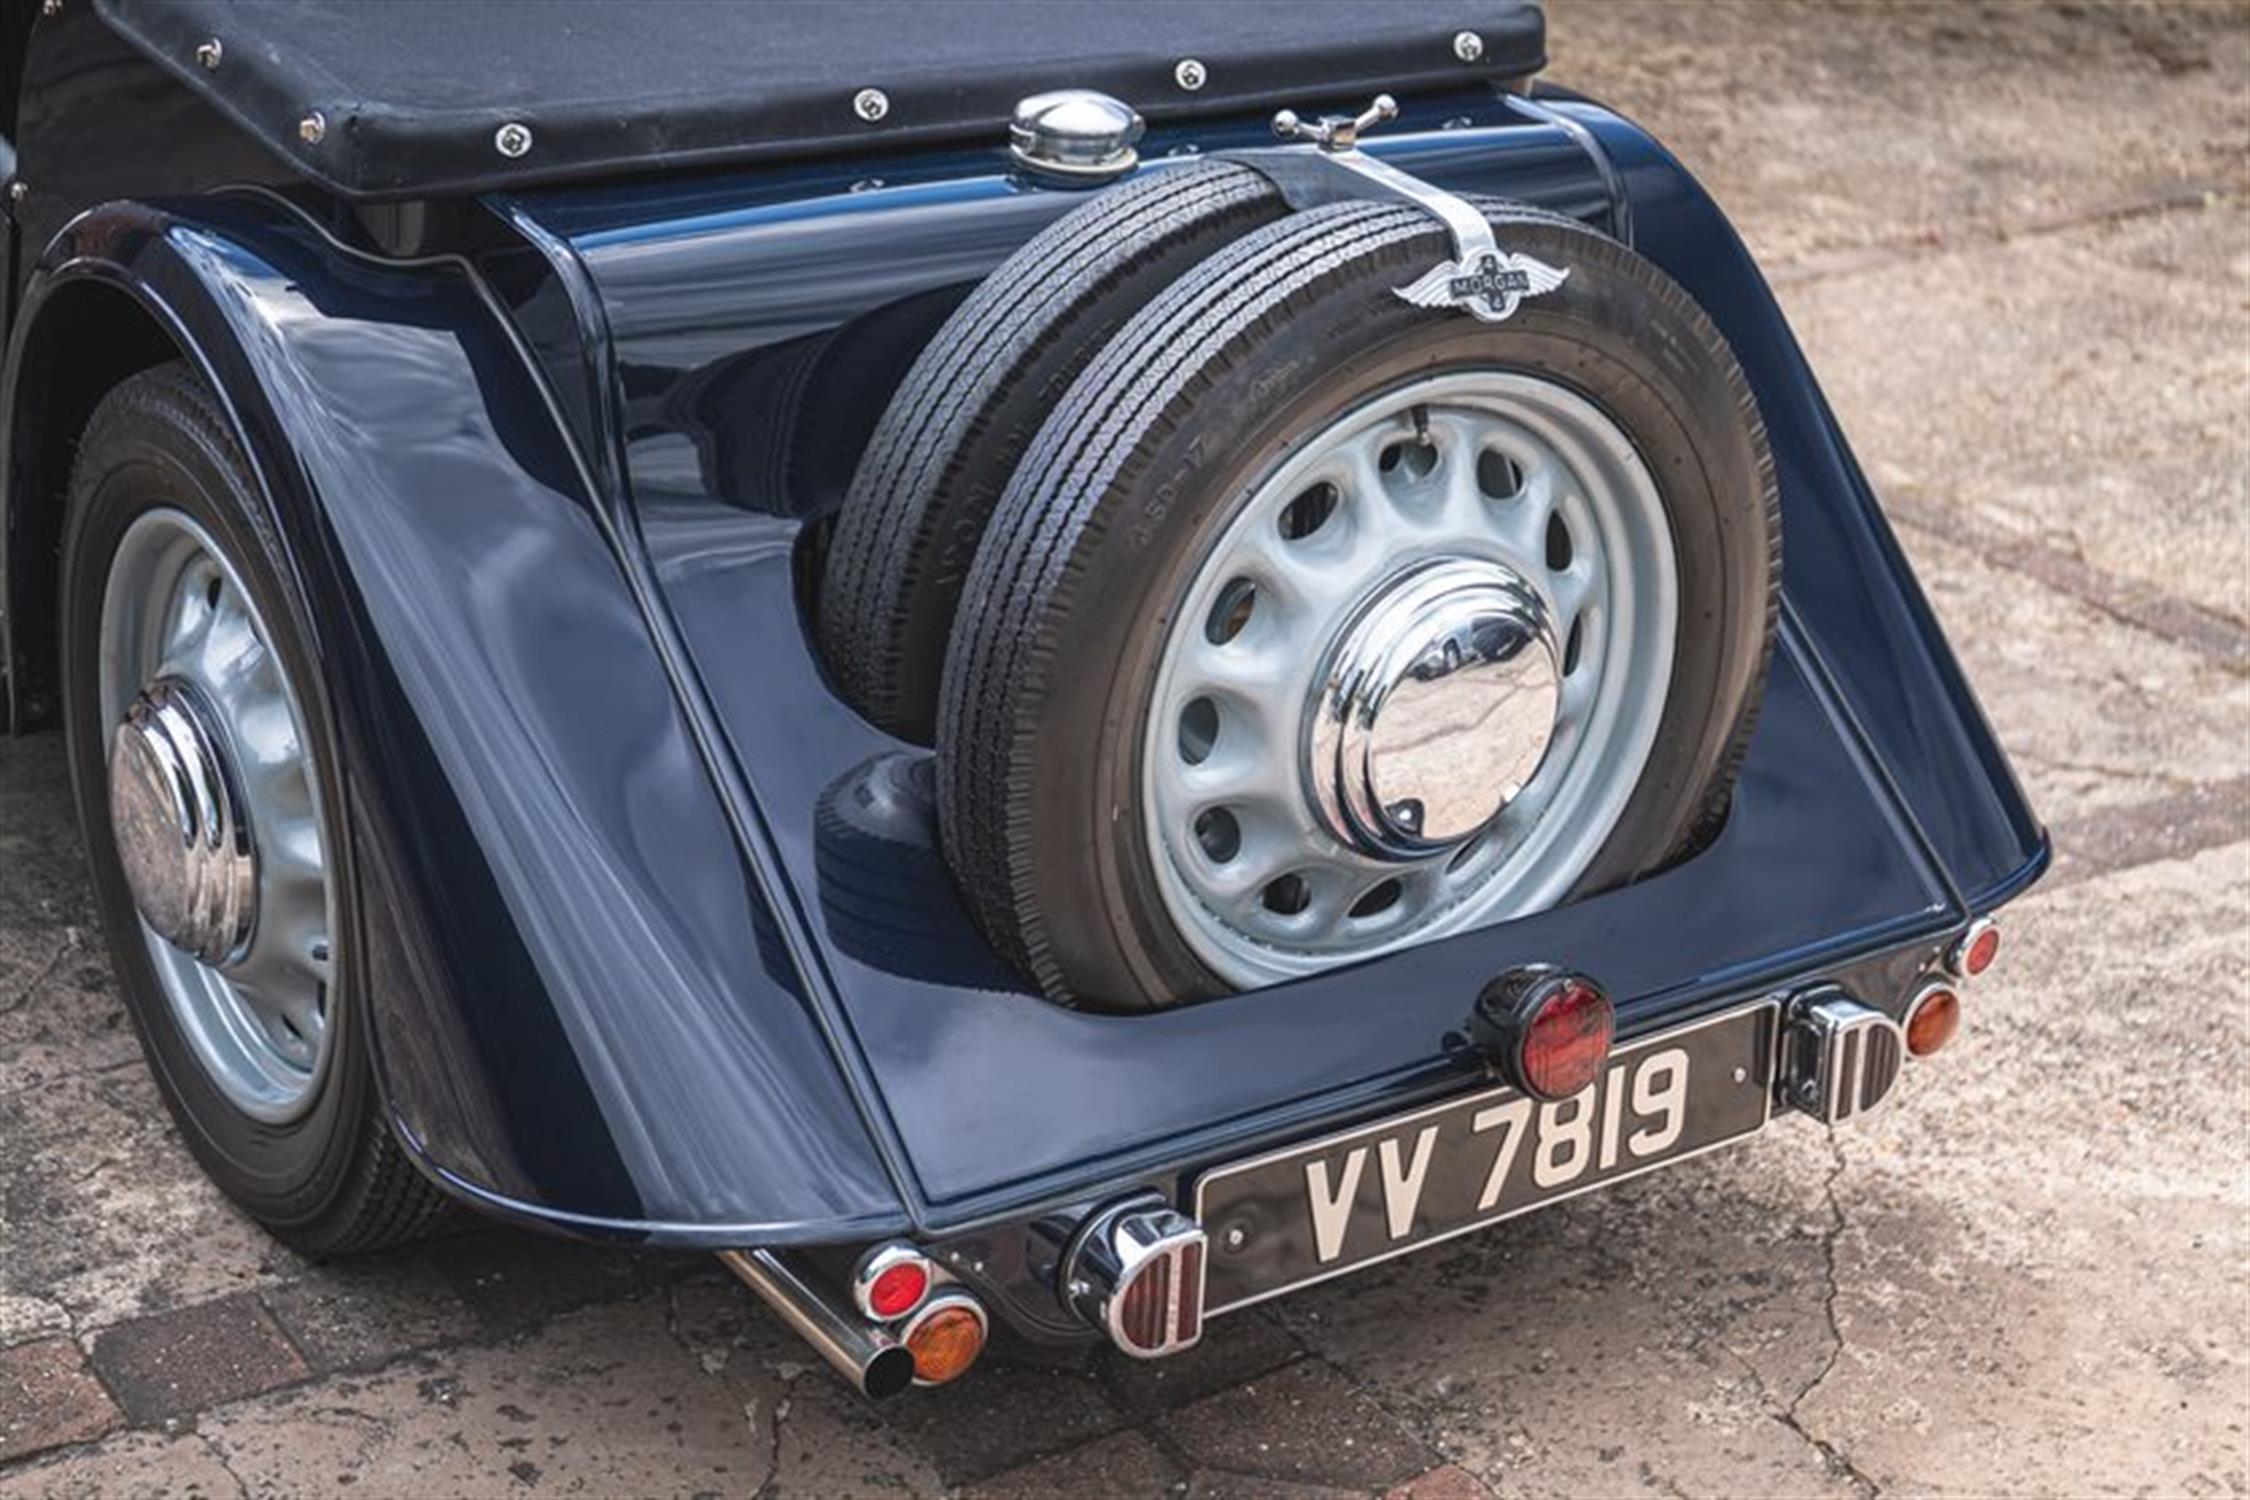 1939 Morgan 4/4 Series 1 'Flat Rad' (1098cc Climax Engine) - Image 8 of 10